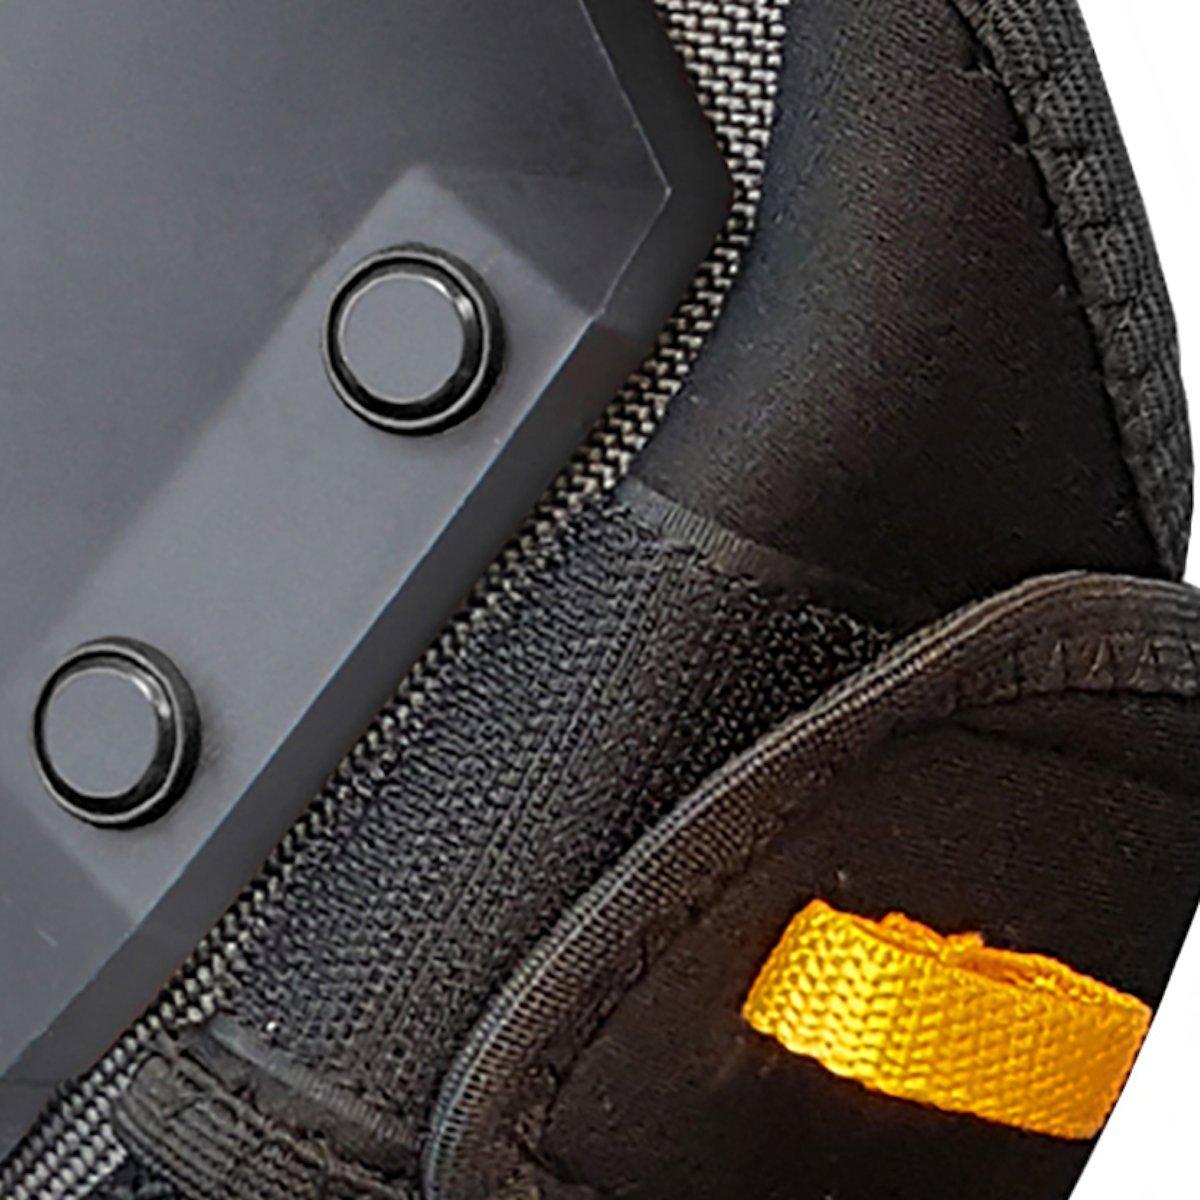 ToughBuilt FoamFit Rocker Professional Knee Pads - Ergonomic Support